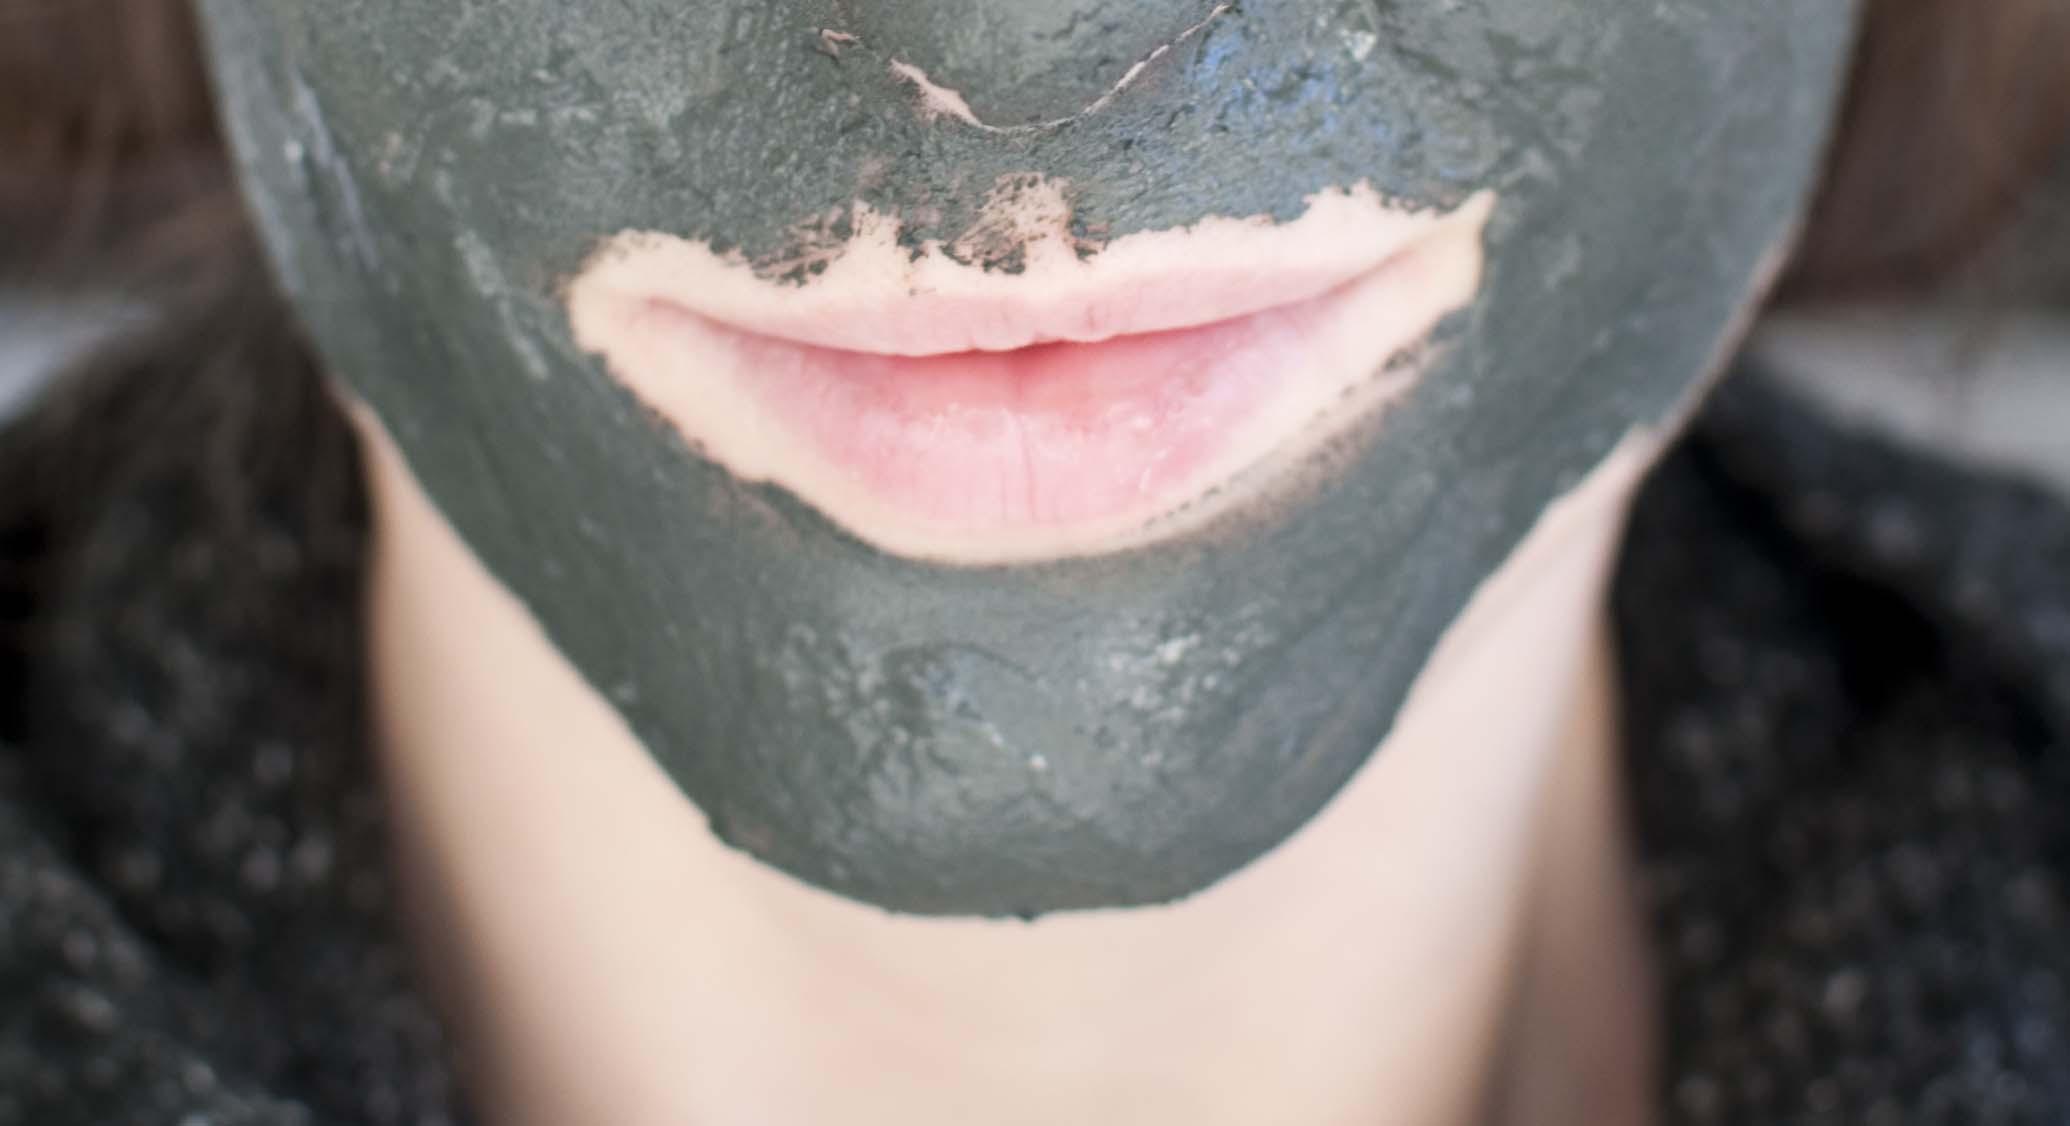 diy charcaol face mask